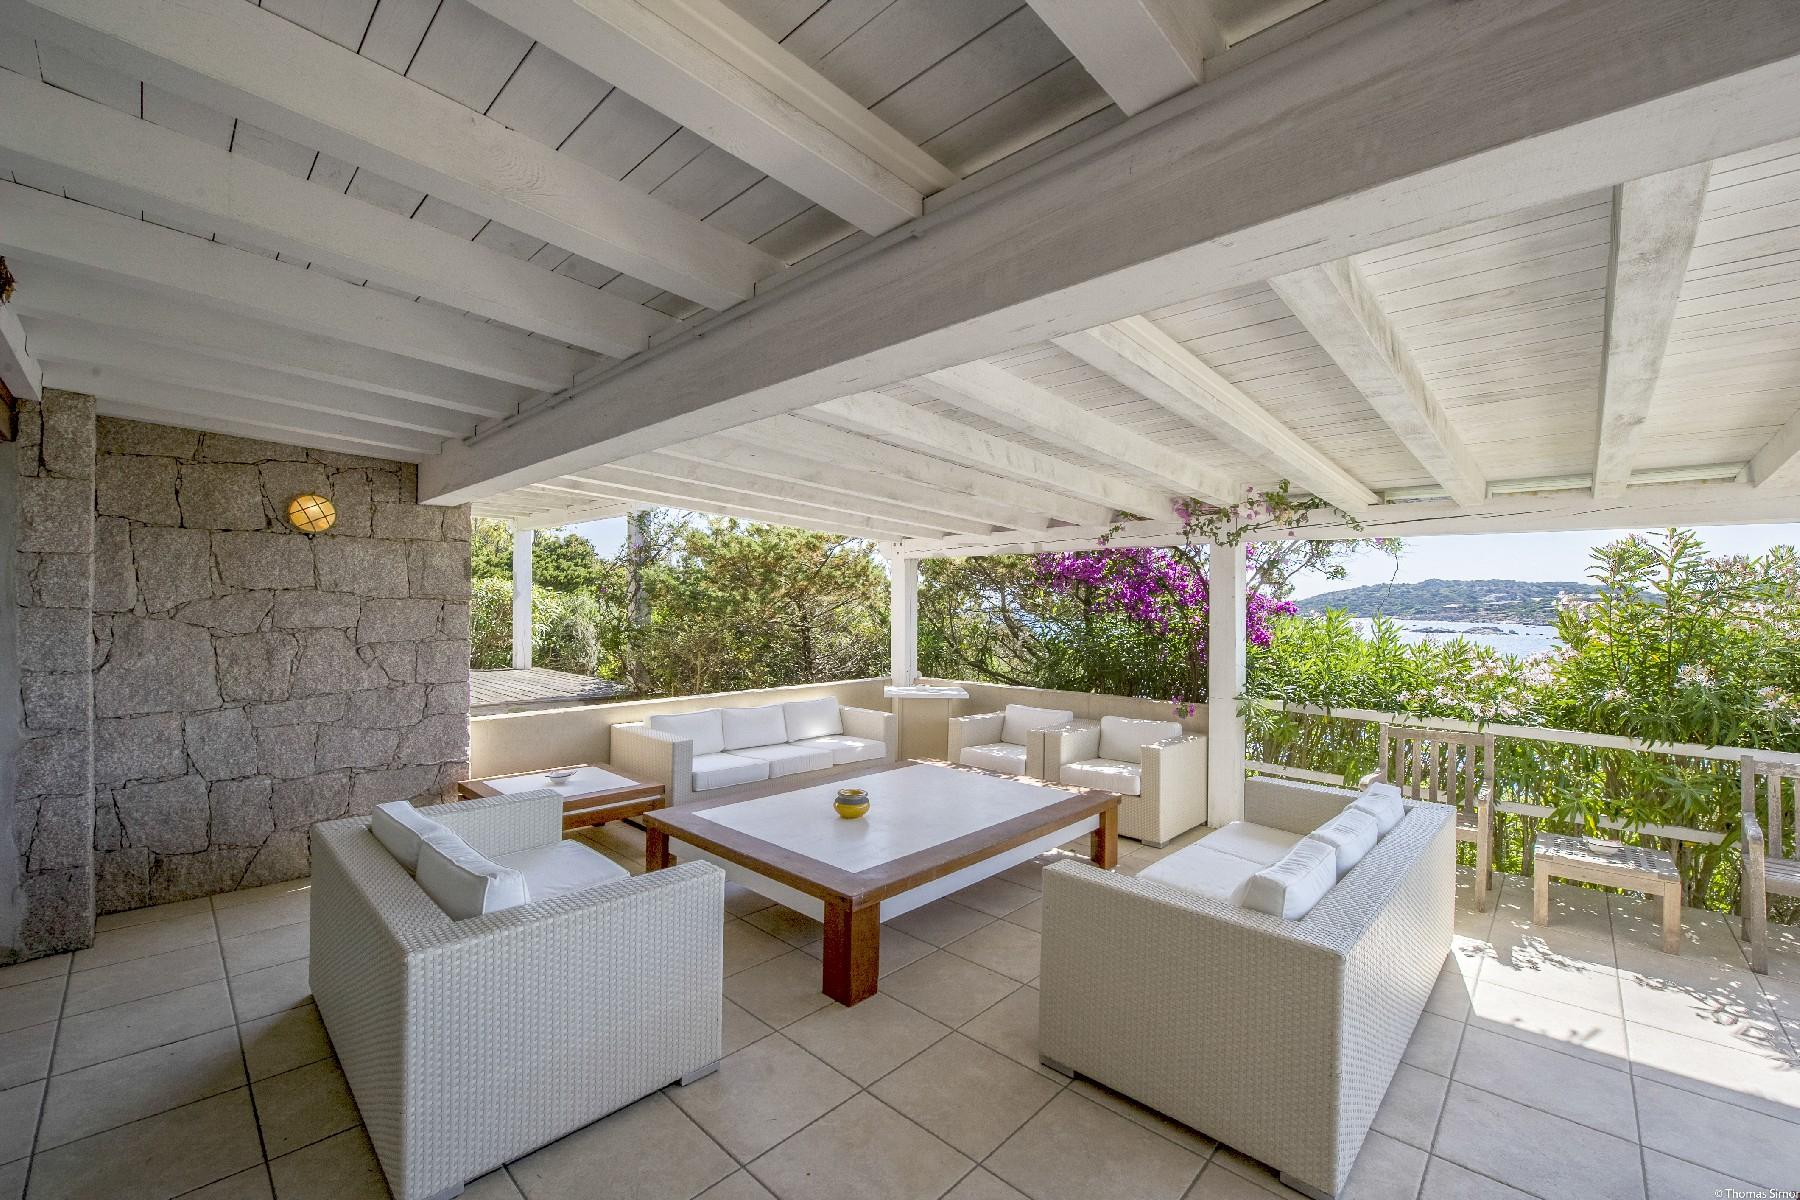 Ile de Cavallo, Corse - Fascinante villa pieds-dans-l'eau - 2